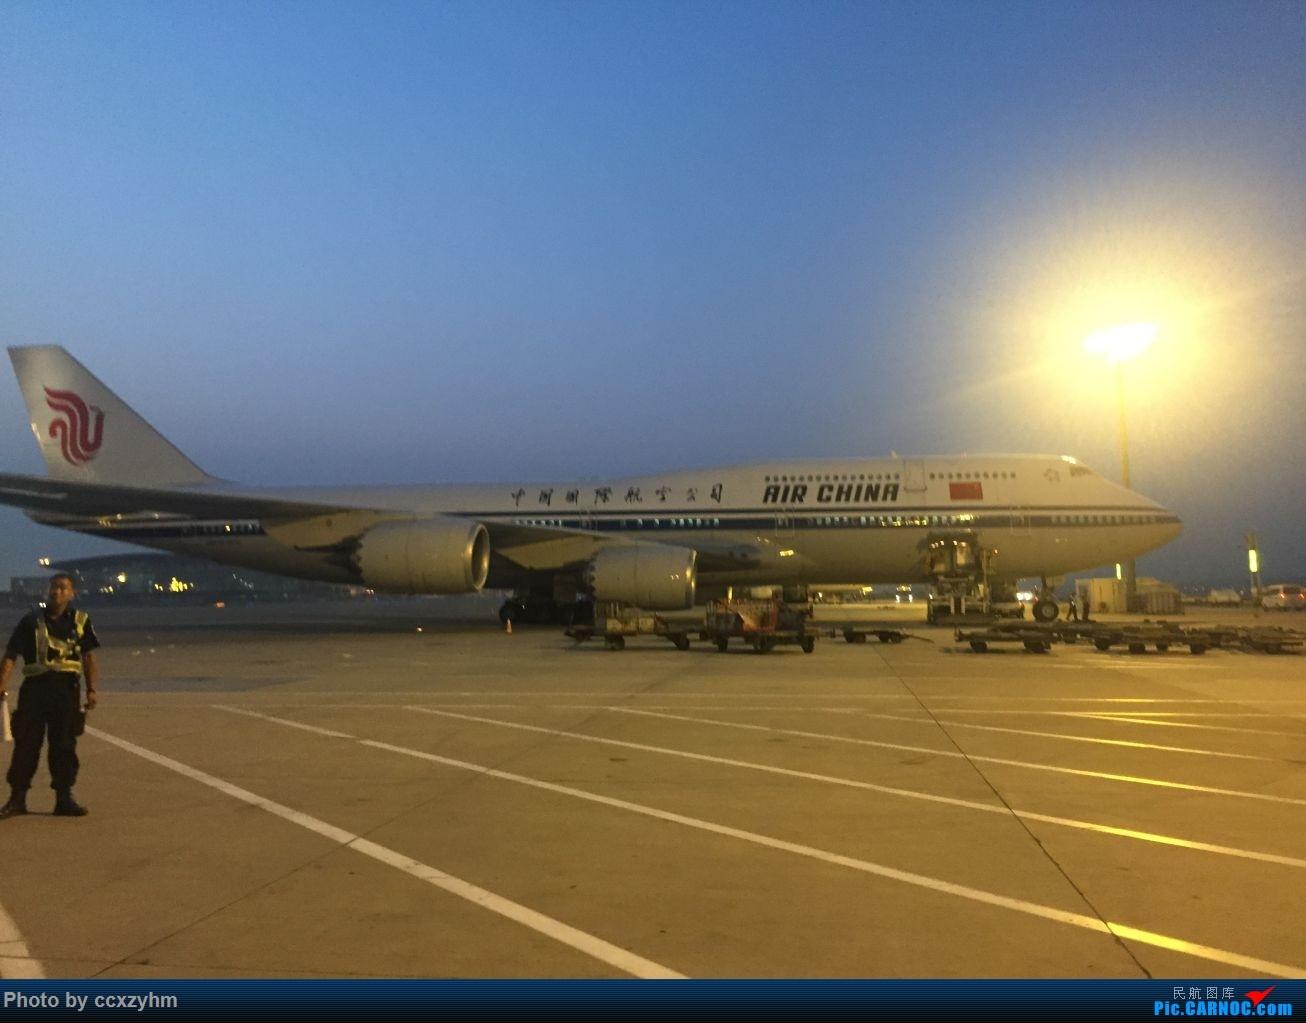 Re:[原创]论坛首发 京沪线上的国航789 高二升高三暑假短Break 空铁联运去北京 BOEING 787-9 B-7877 中国北京首都国际机场